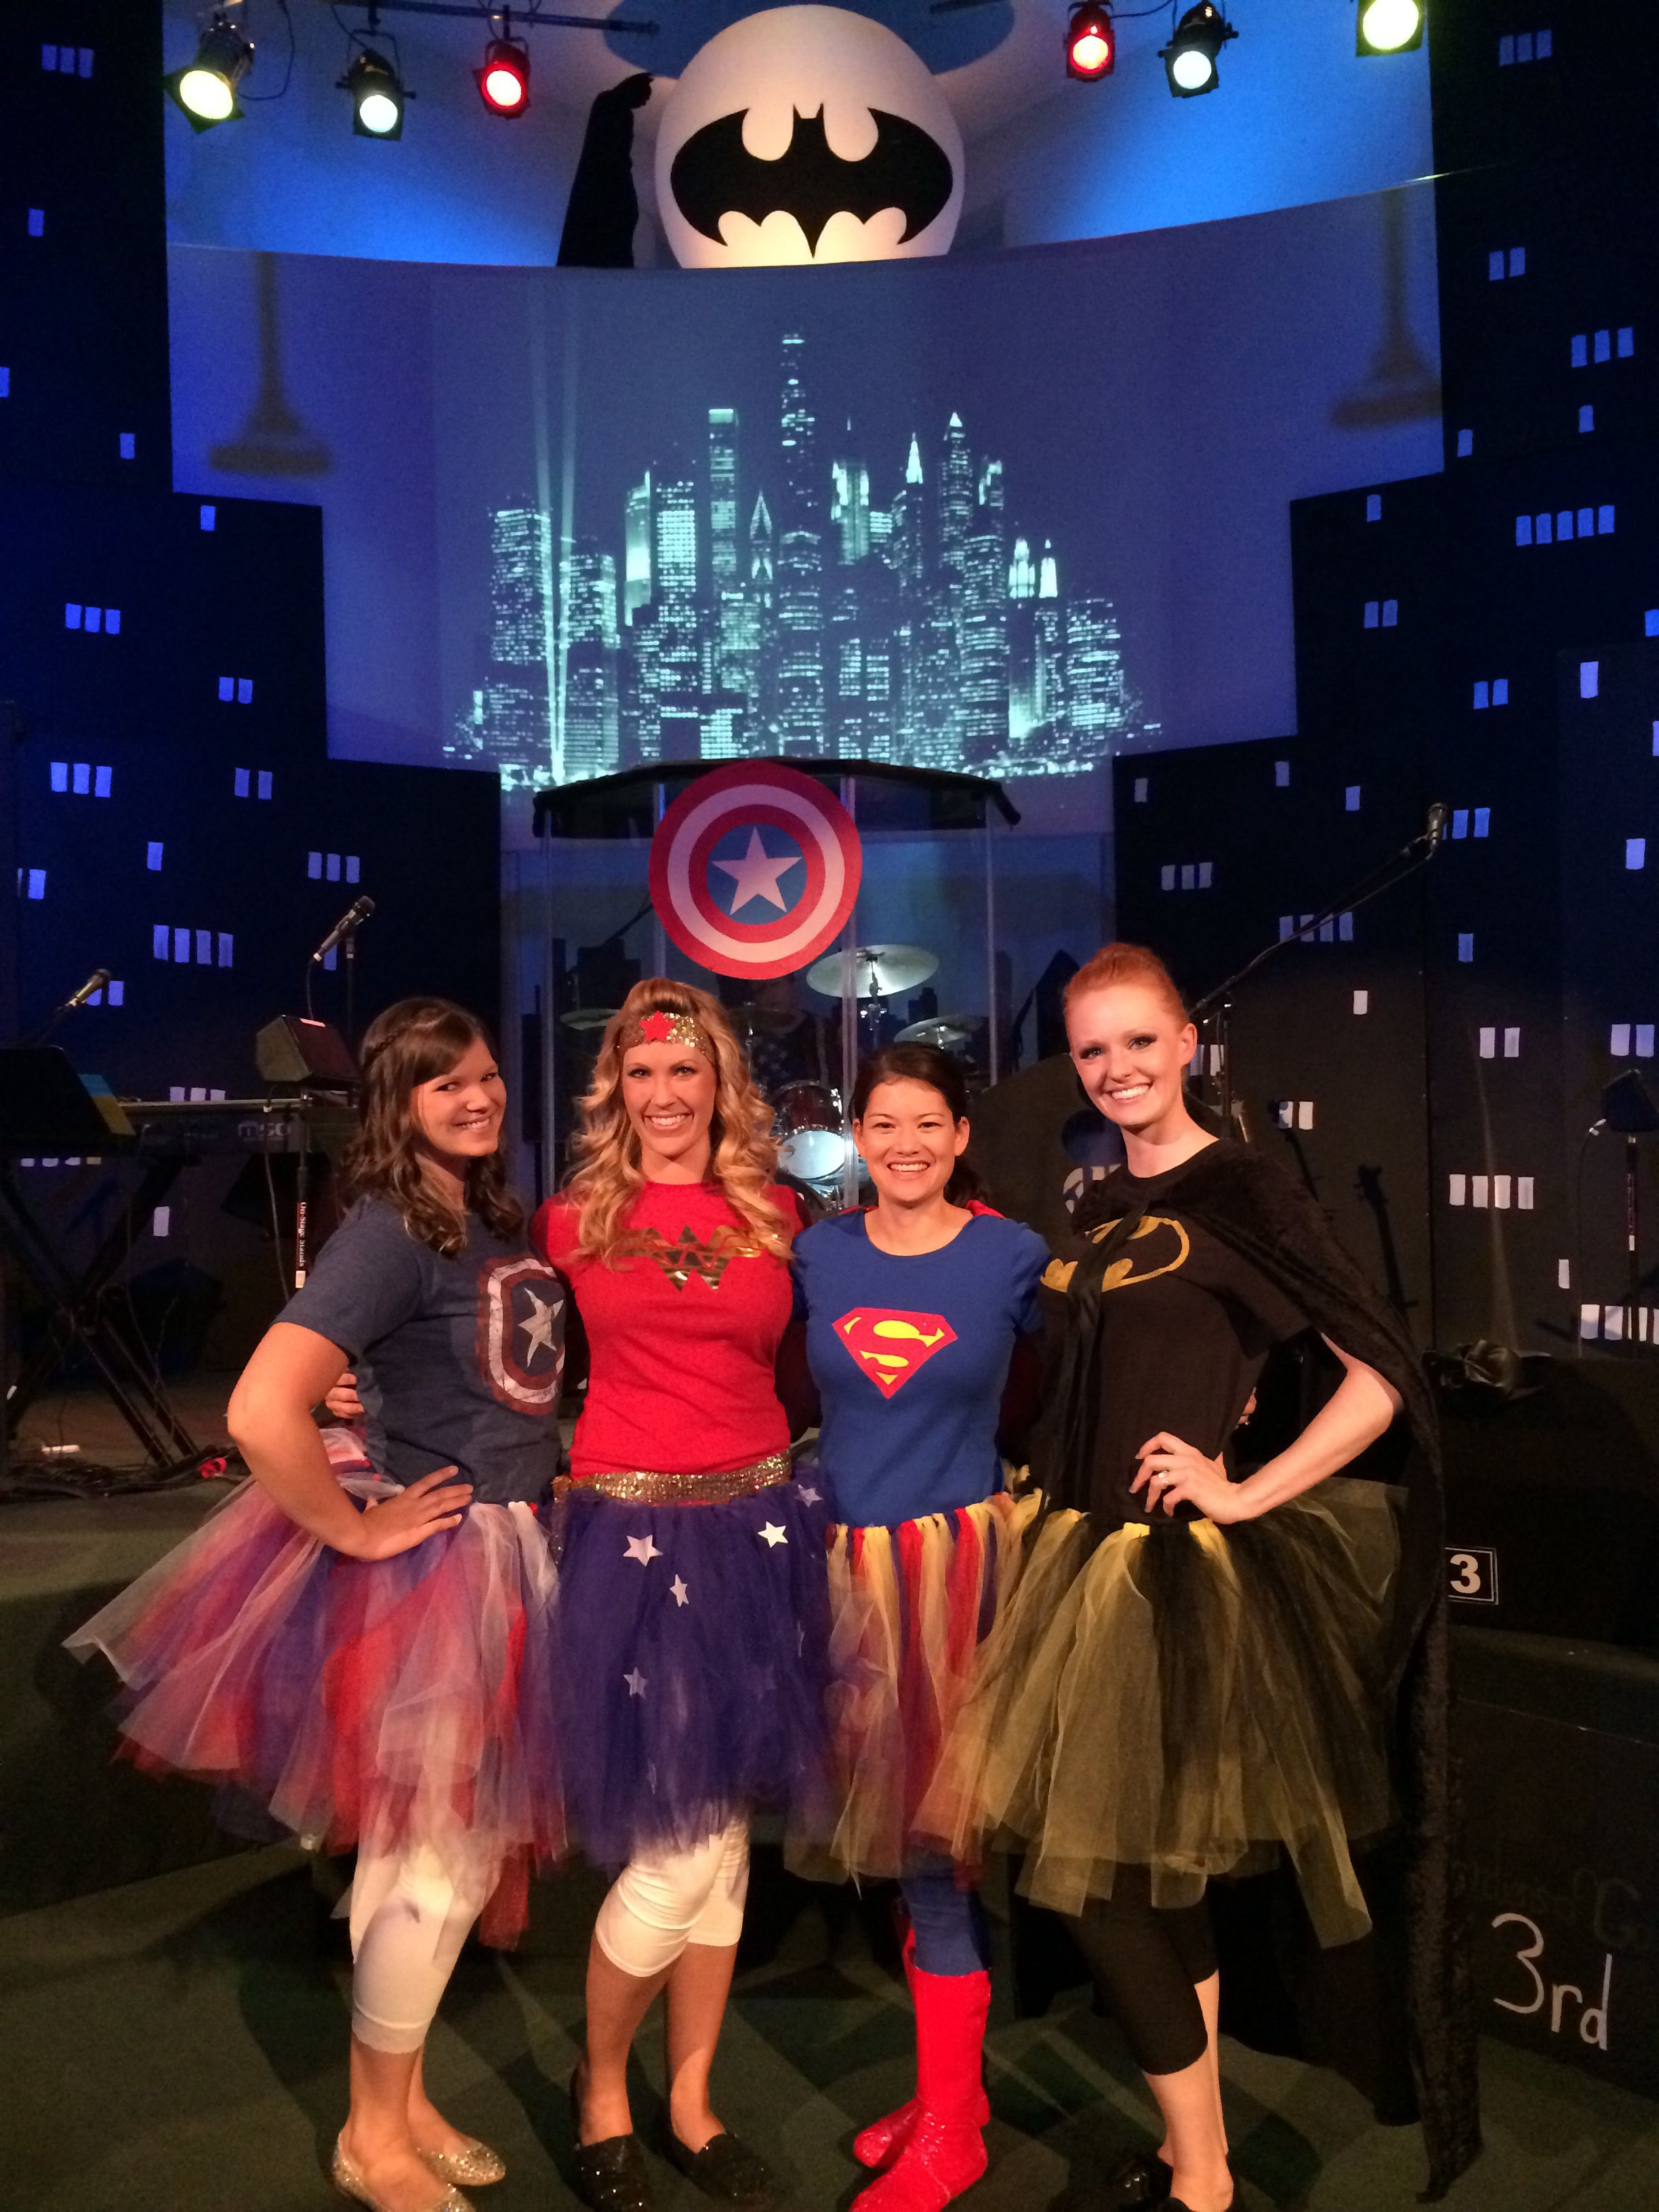 Superhero costume for girls or women. Superhero tutus